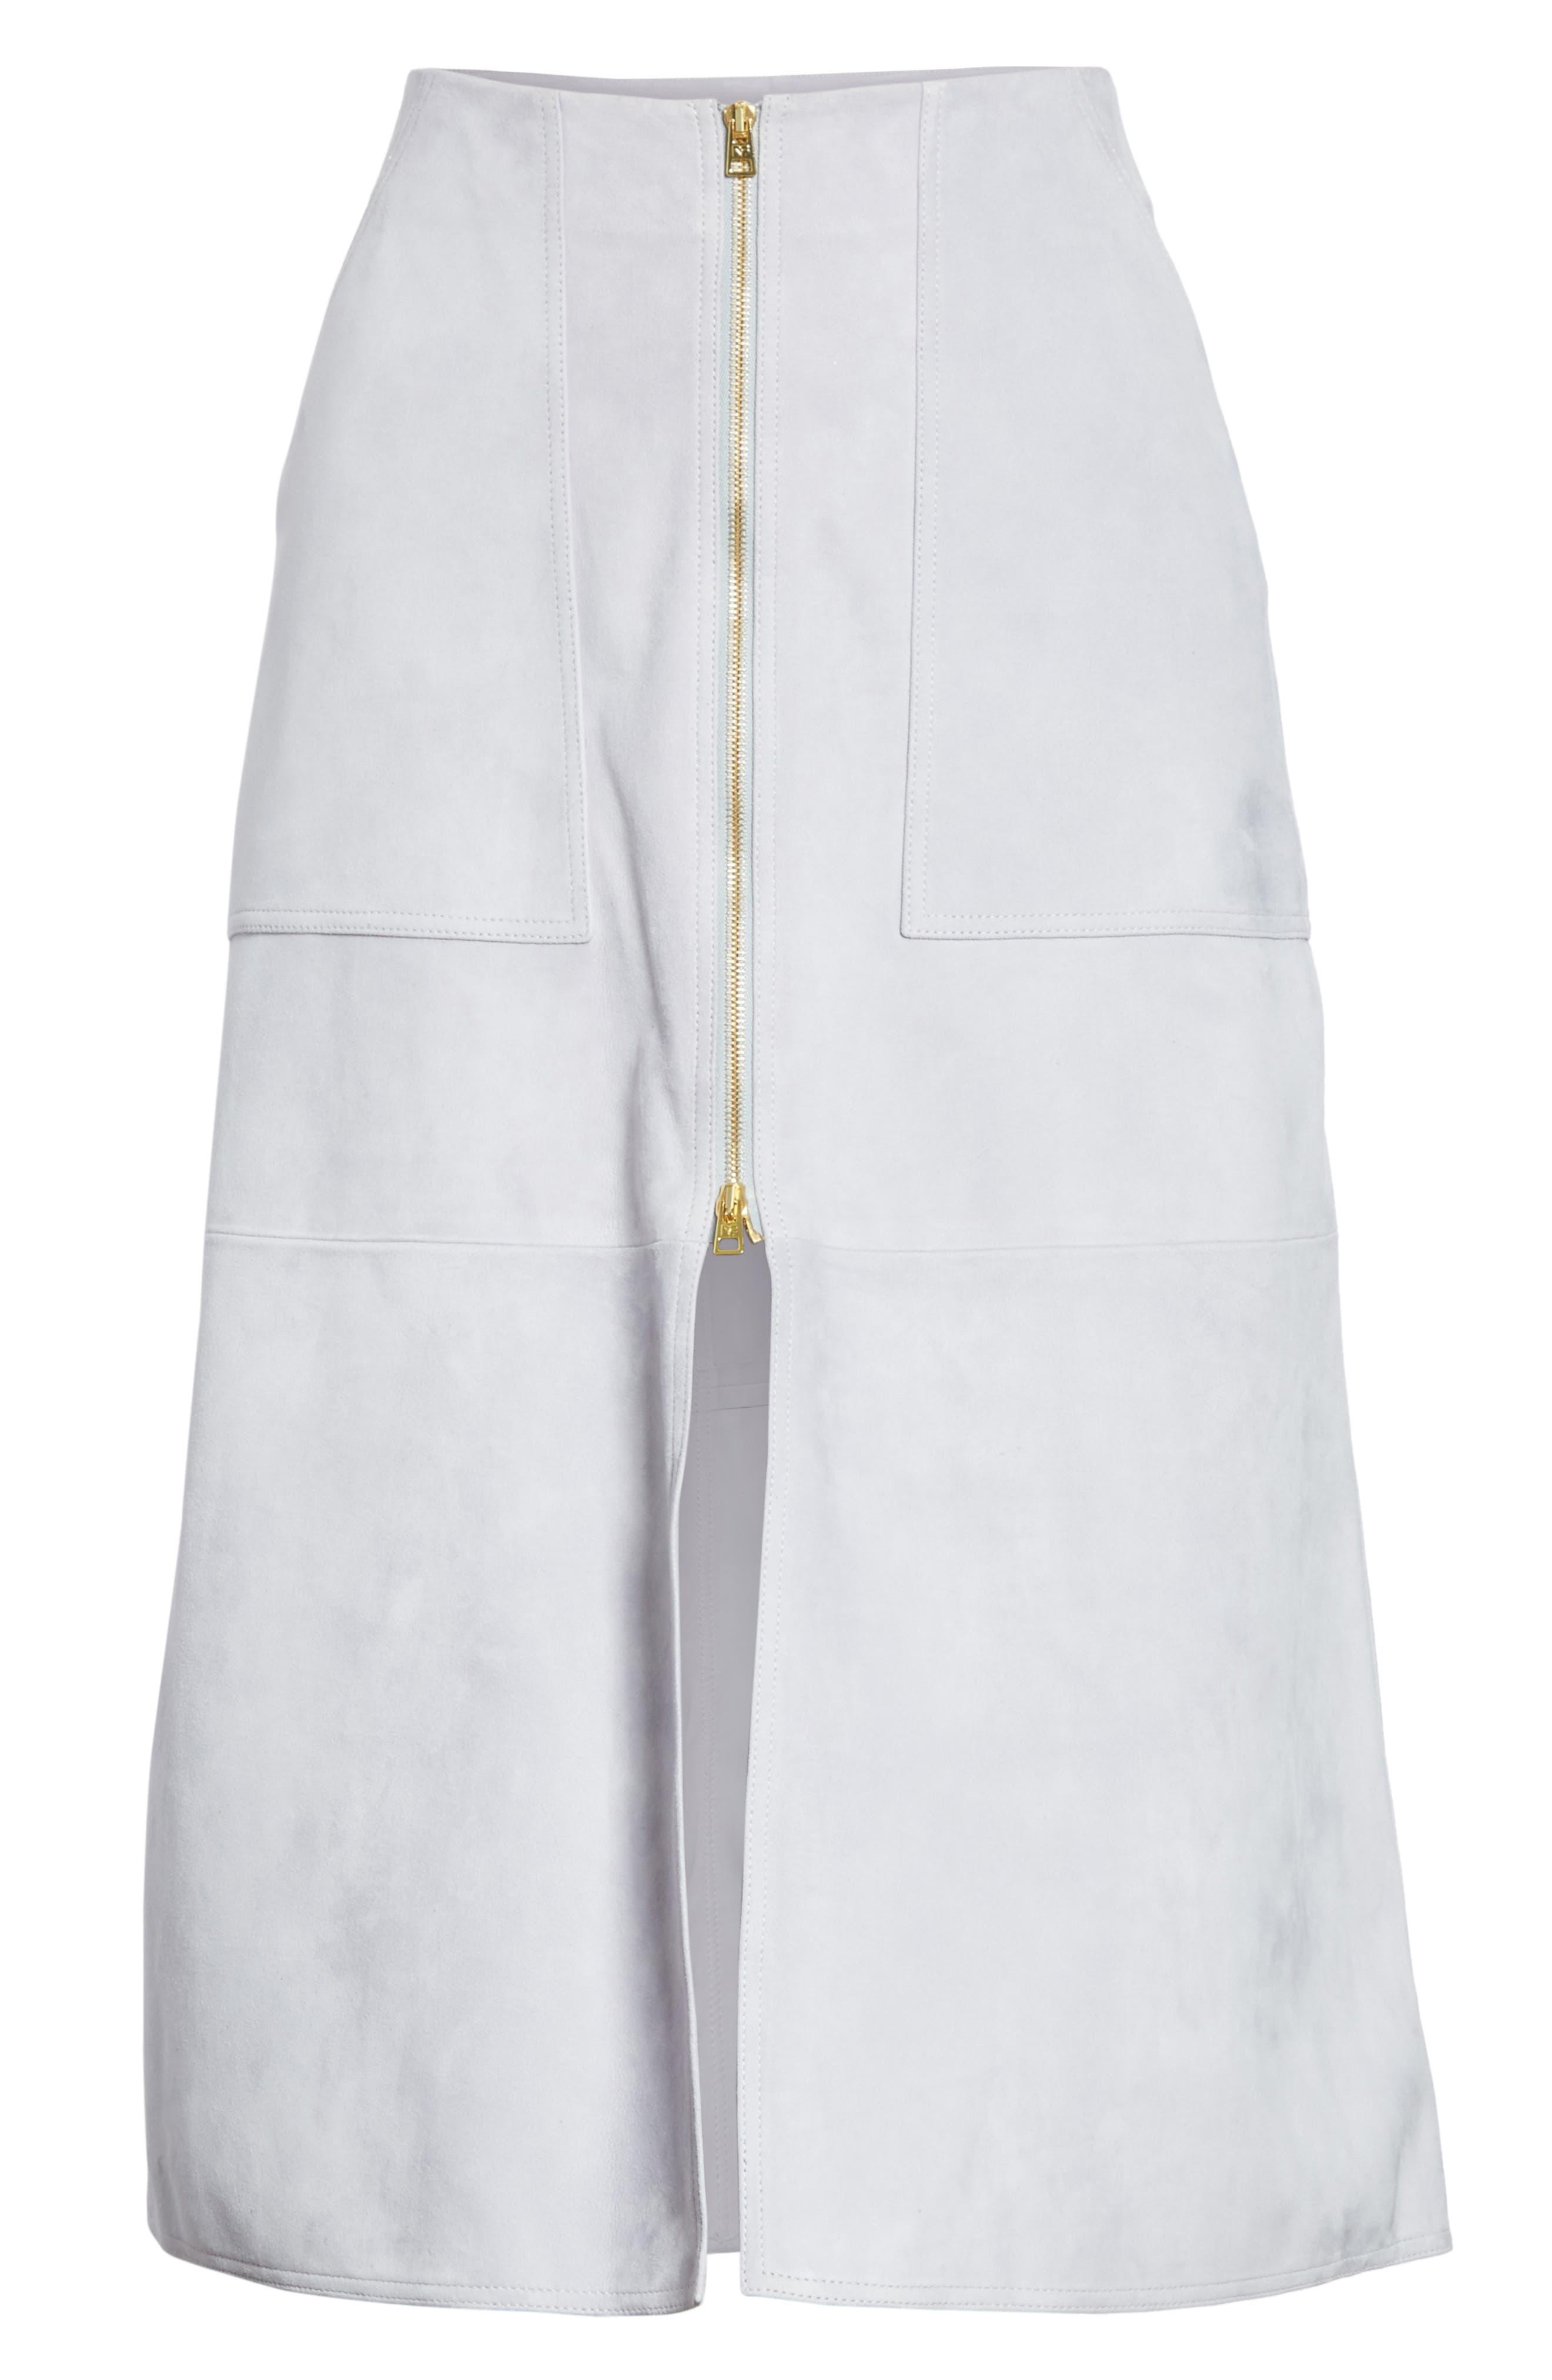 Diane von Furstenberg Patch Pocket Suede Midi Skirt,                             Alternate thumbnail 6, color,                             Smoke